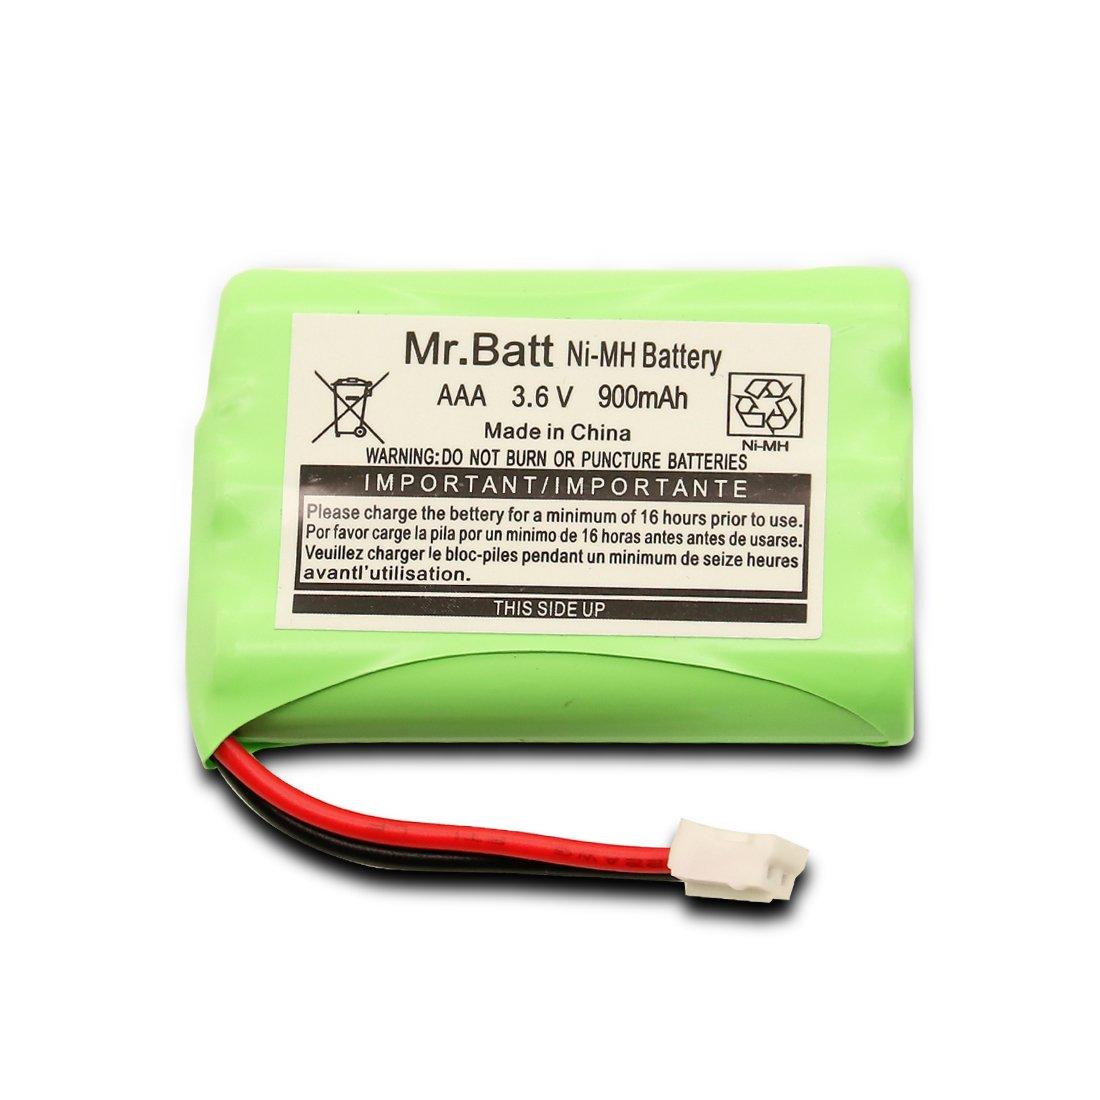 BestBatt 900mAh Replacement Battery for Motorola MBP27T, MBP33, MBP33S, MBP33PU, MBP36, MBP36S, MBP36PU Baby Monitors SHENZHEN YOUDA TECHNOLOGY CO. LTD MB-MOT-MBP33